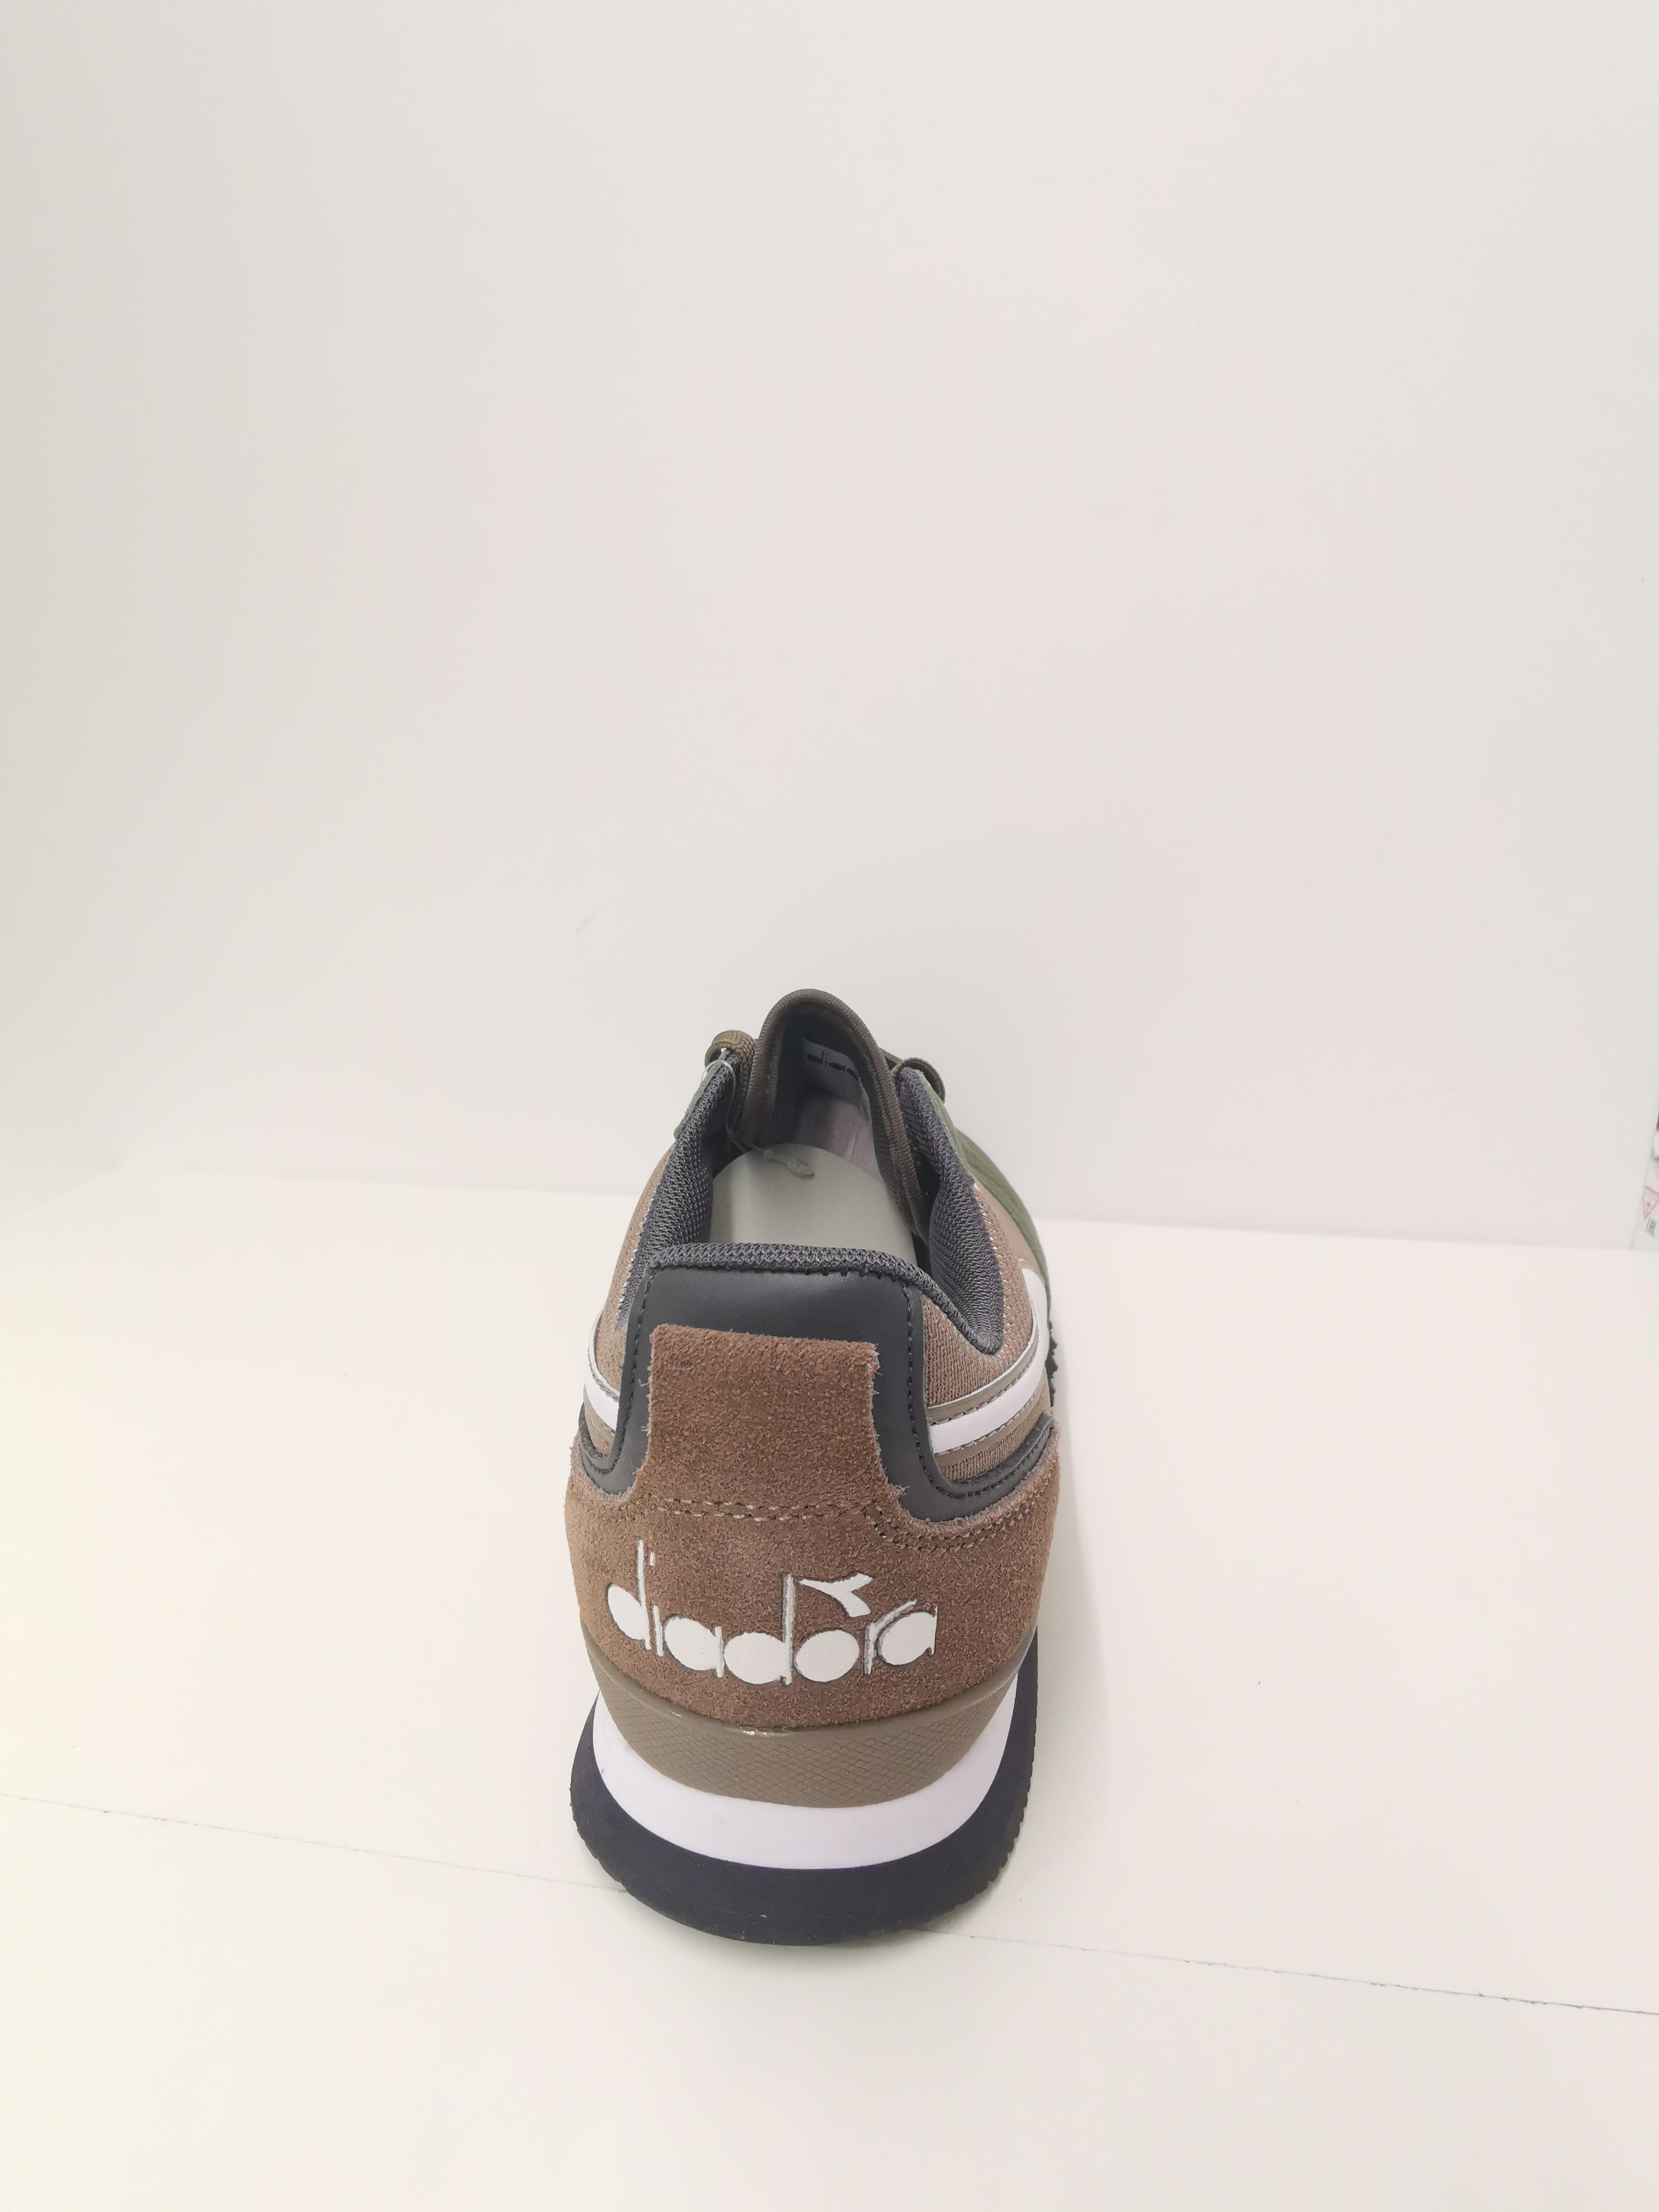 Sneaker olympia DIADORA | Scarpe | 101.17437670165 VERDE SANDALO